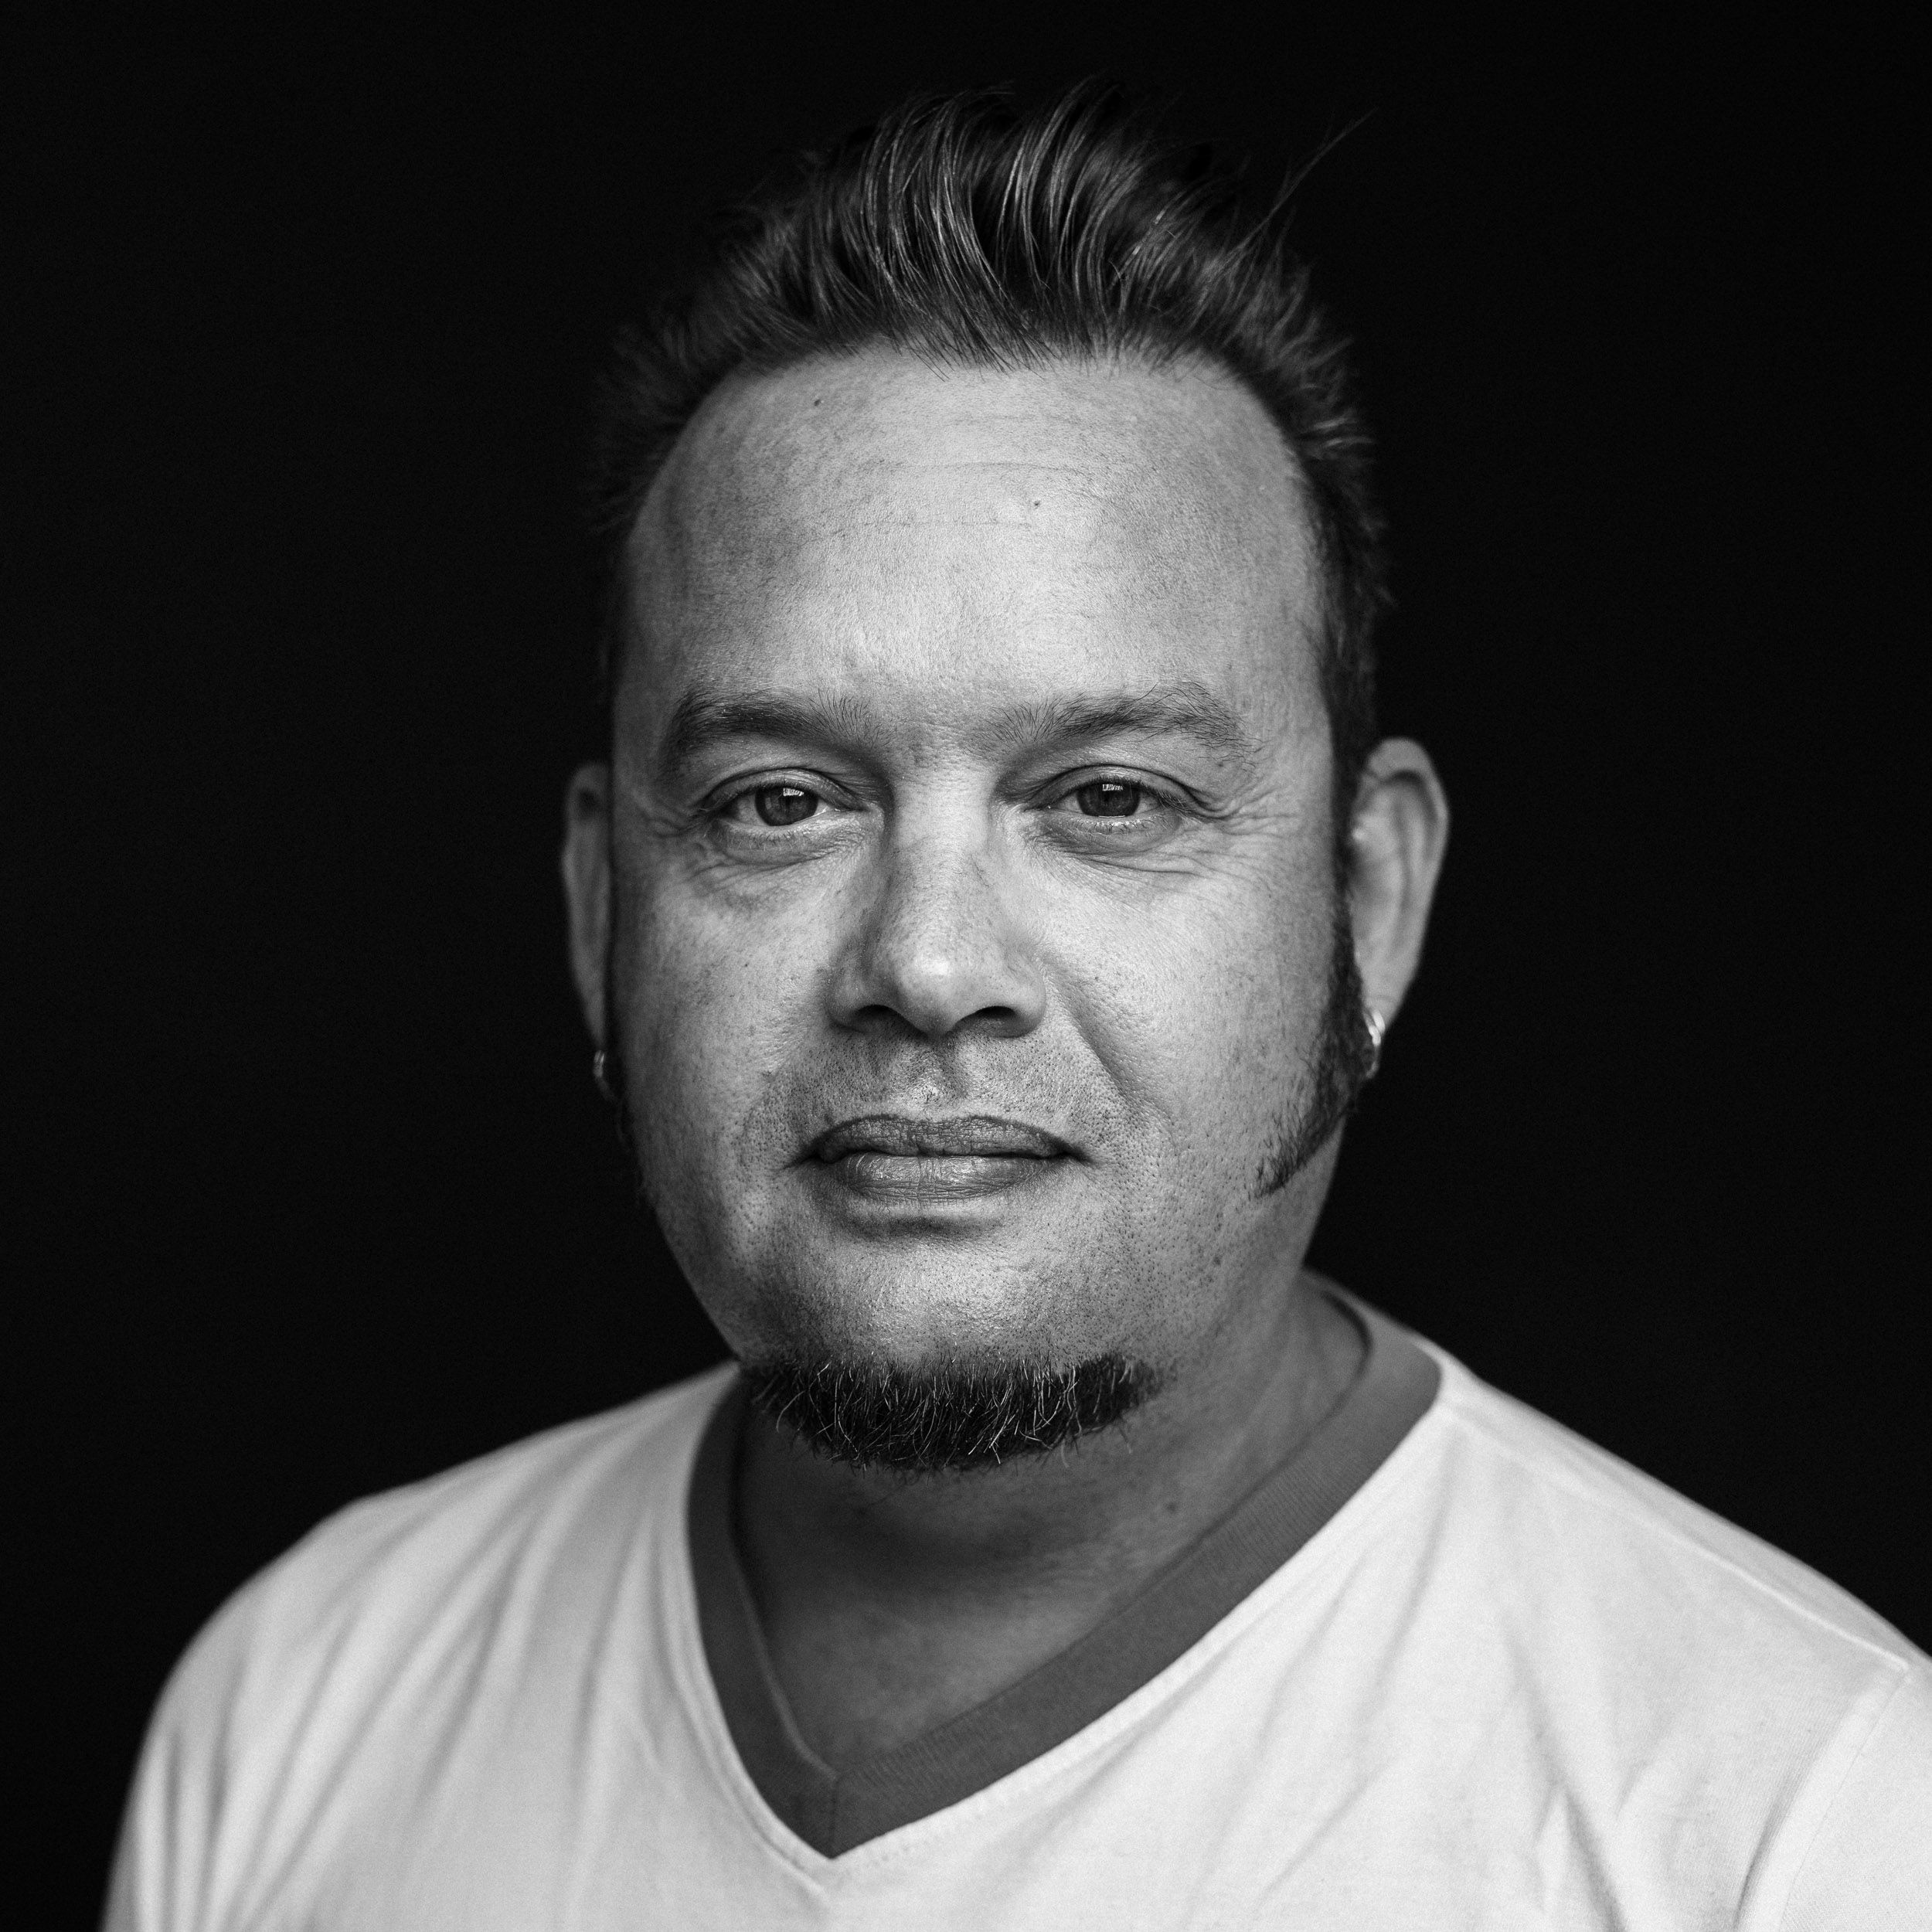 Mark Boninsegna